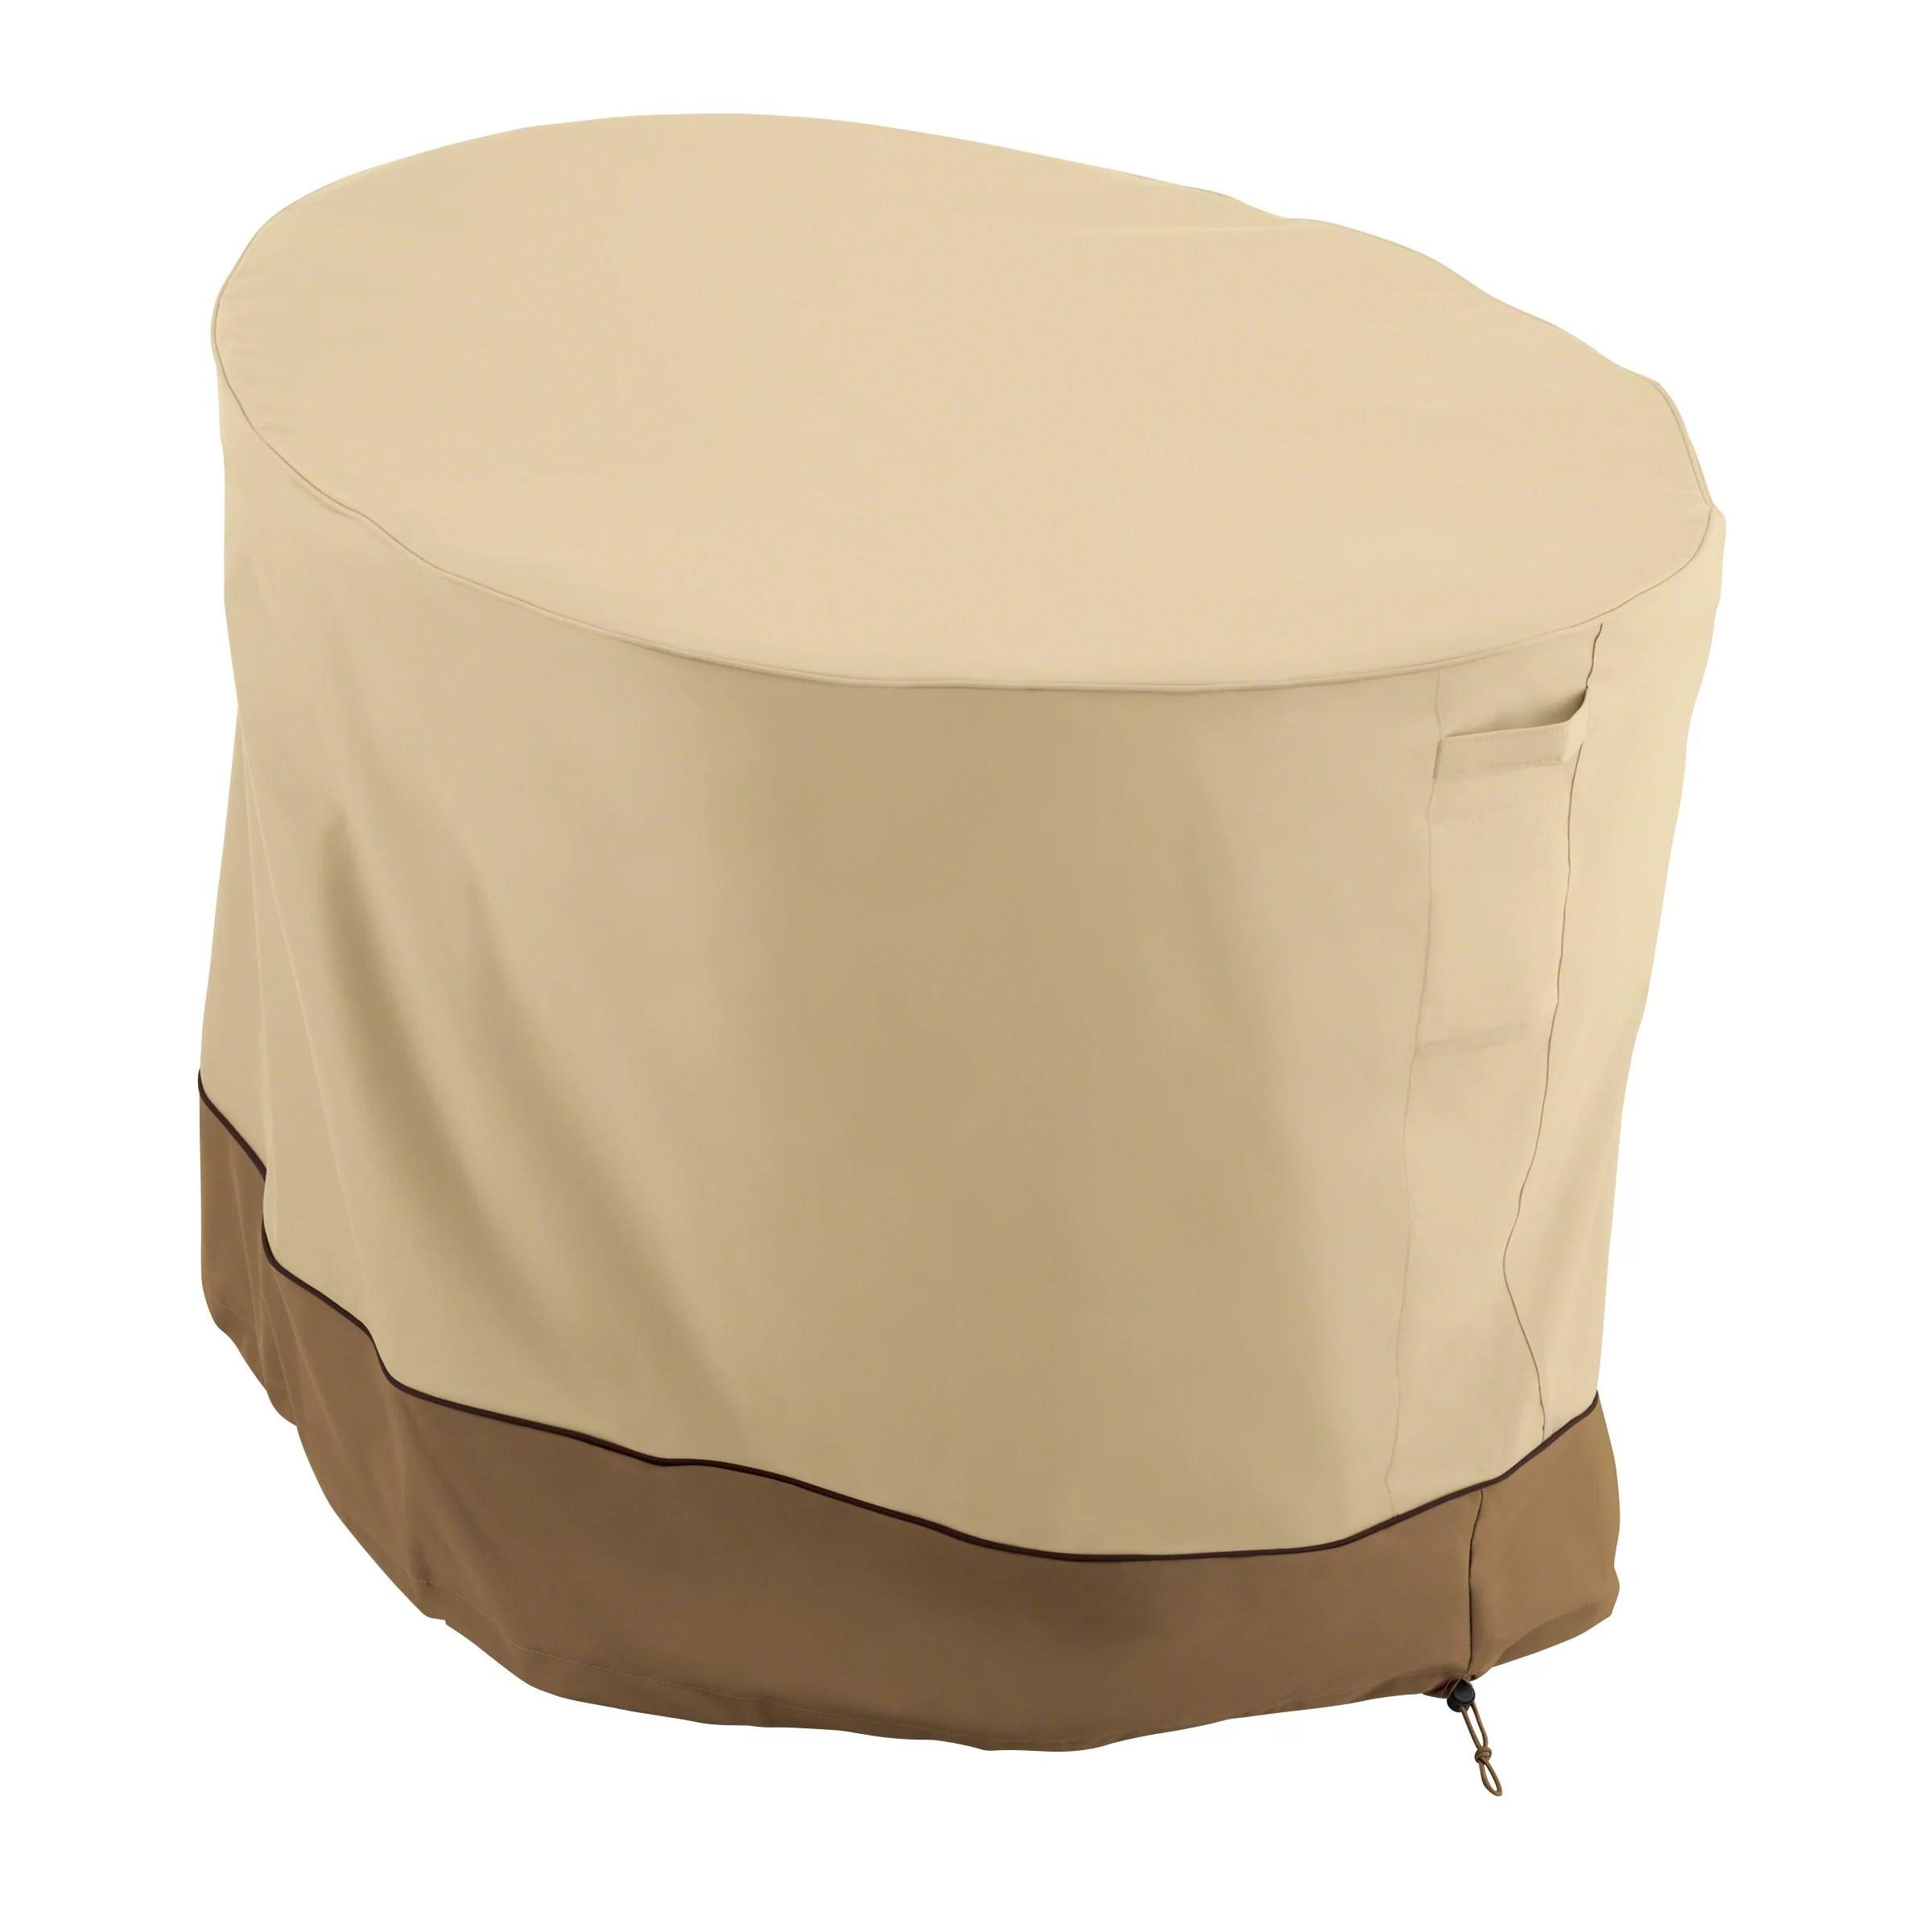 walmart deck chair covers lounge canopy classic accessories veranda papasan patio cover